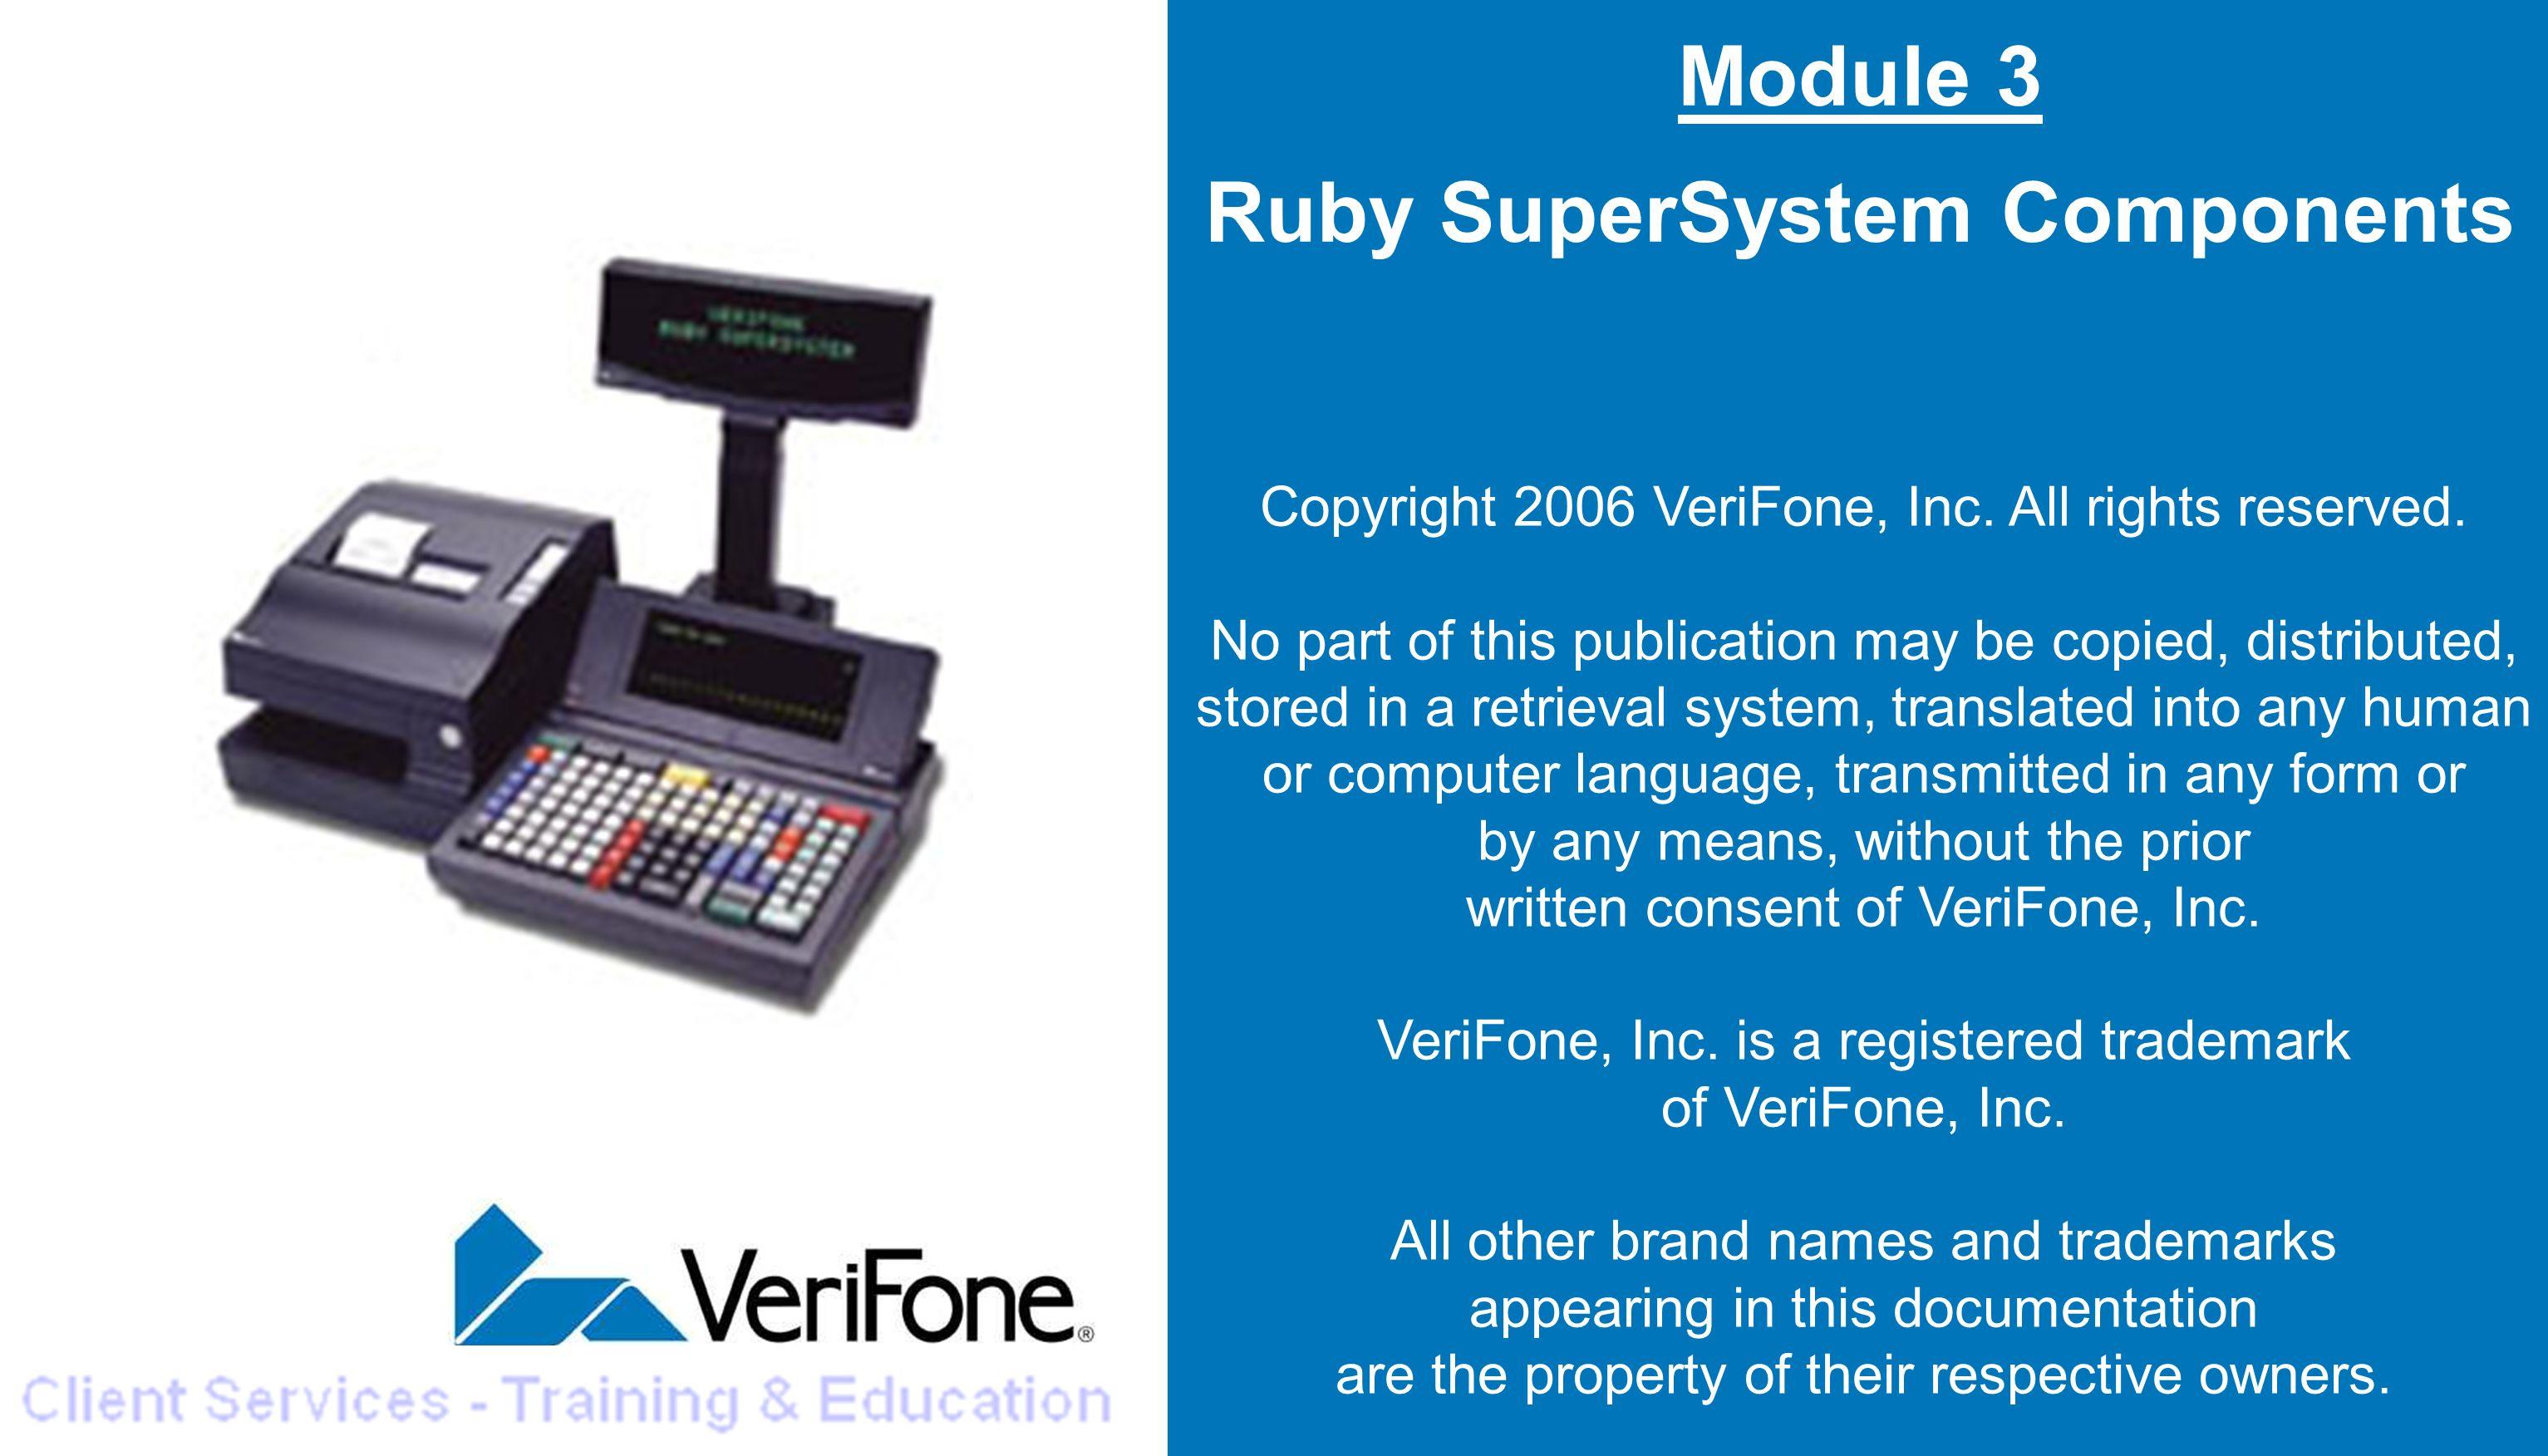 module 3 ruby supersystem components copyright 2006 verifone inc rh slideplayer com Verifone Ruby Printer Verifone Ruby Cash Register Manual